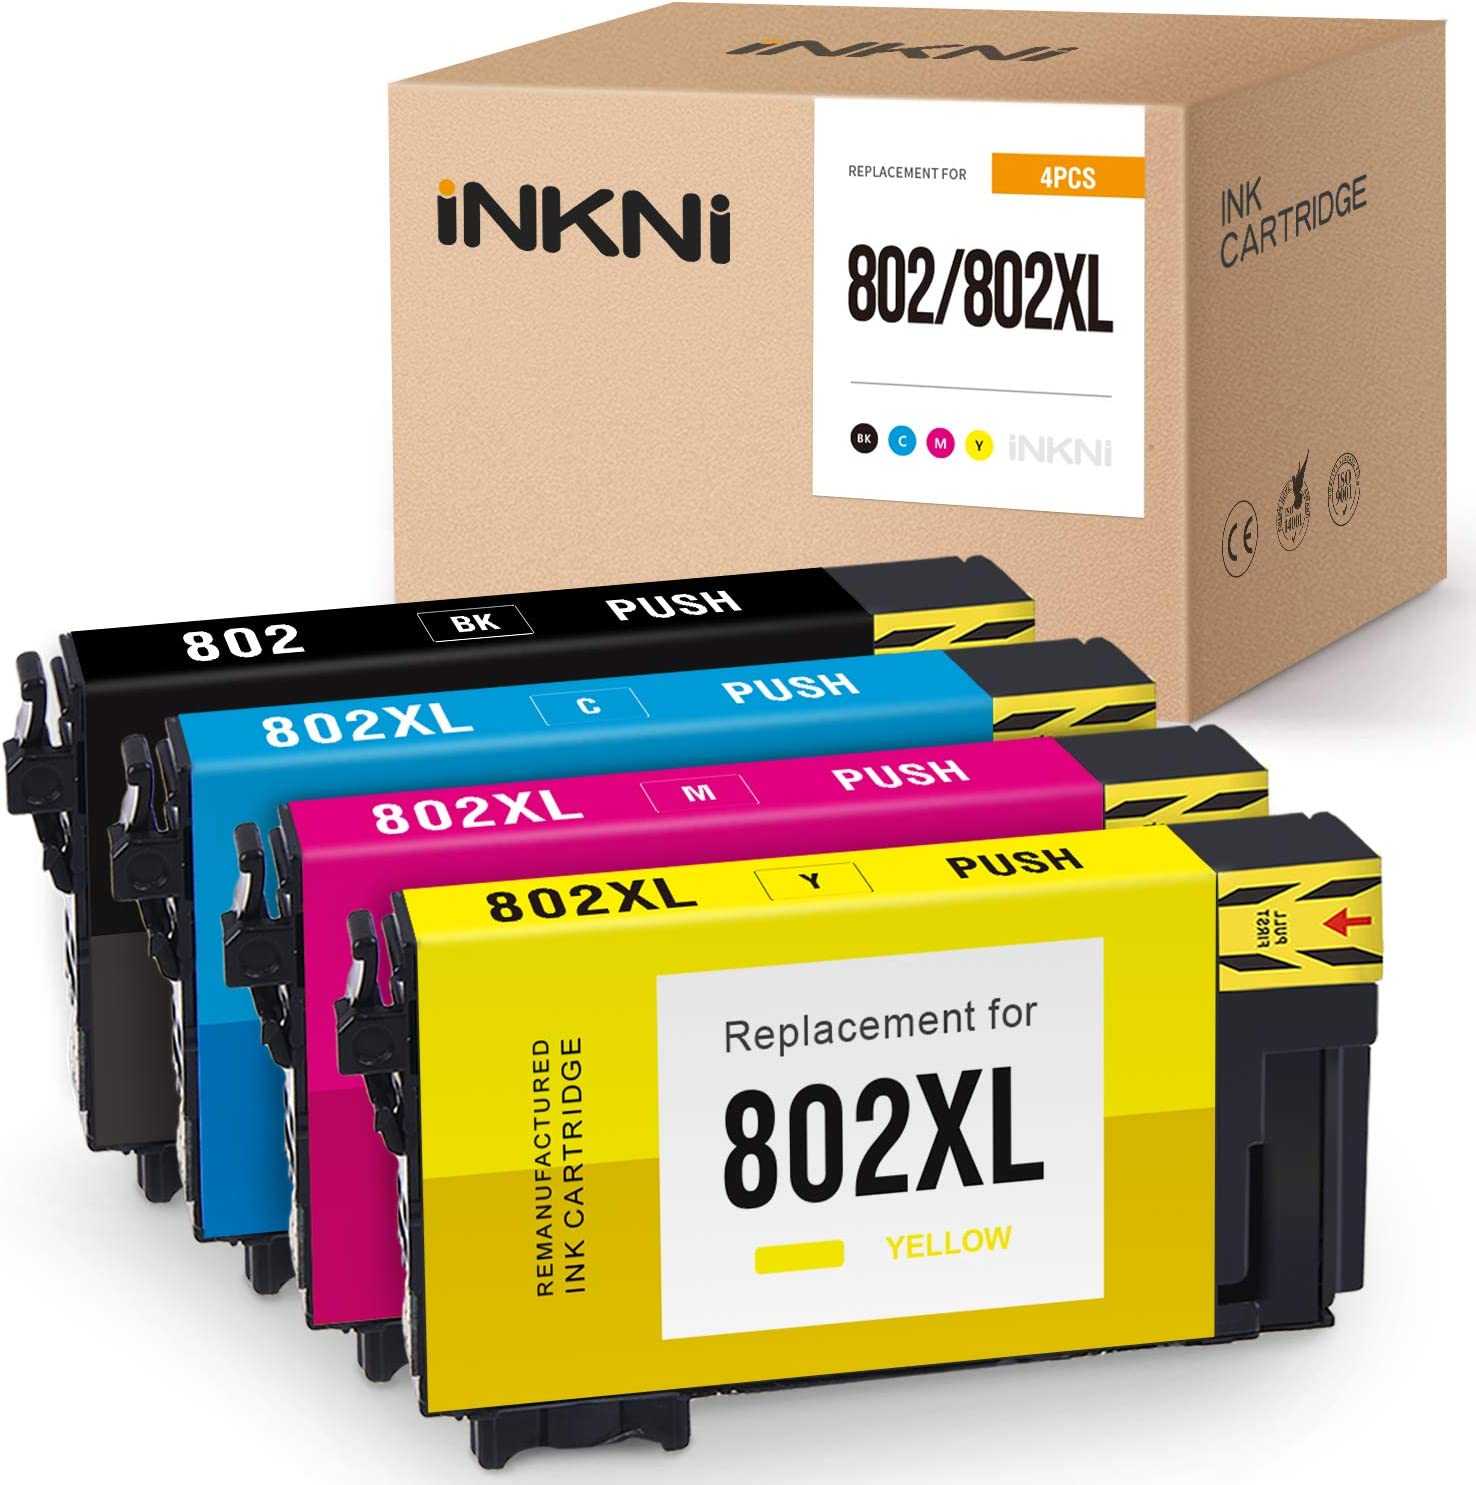 INKNI Remanufactured Ink Cartridge Replacement for Epson 802 802XL T802XL for Workforce Pro WF-4730 WF-4734 WF-4740 WF-4720 EC-4020 EC-4030 EC-4040 Printer Ink (Black, Cyan, Magenta, Yellow, 4-Pack)